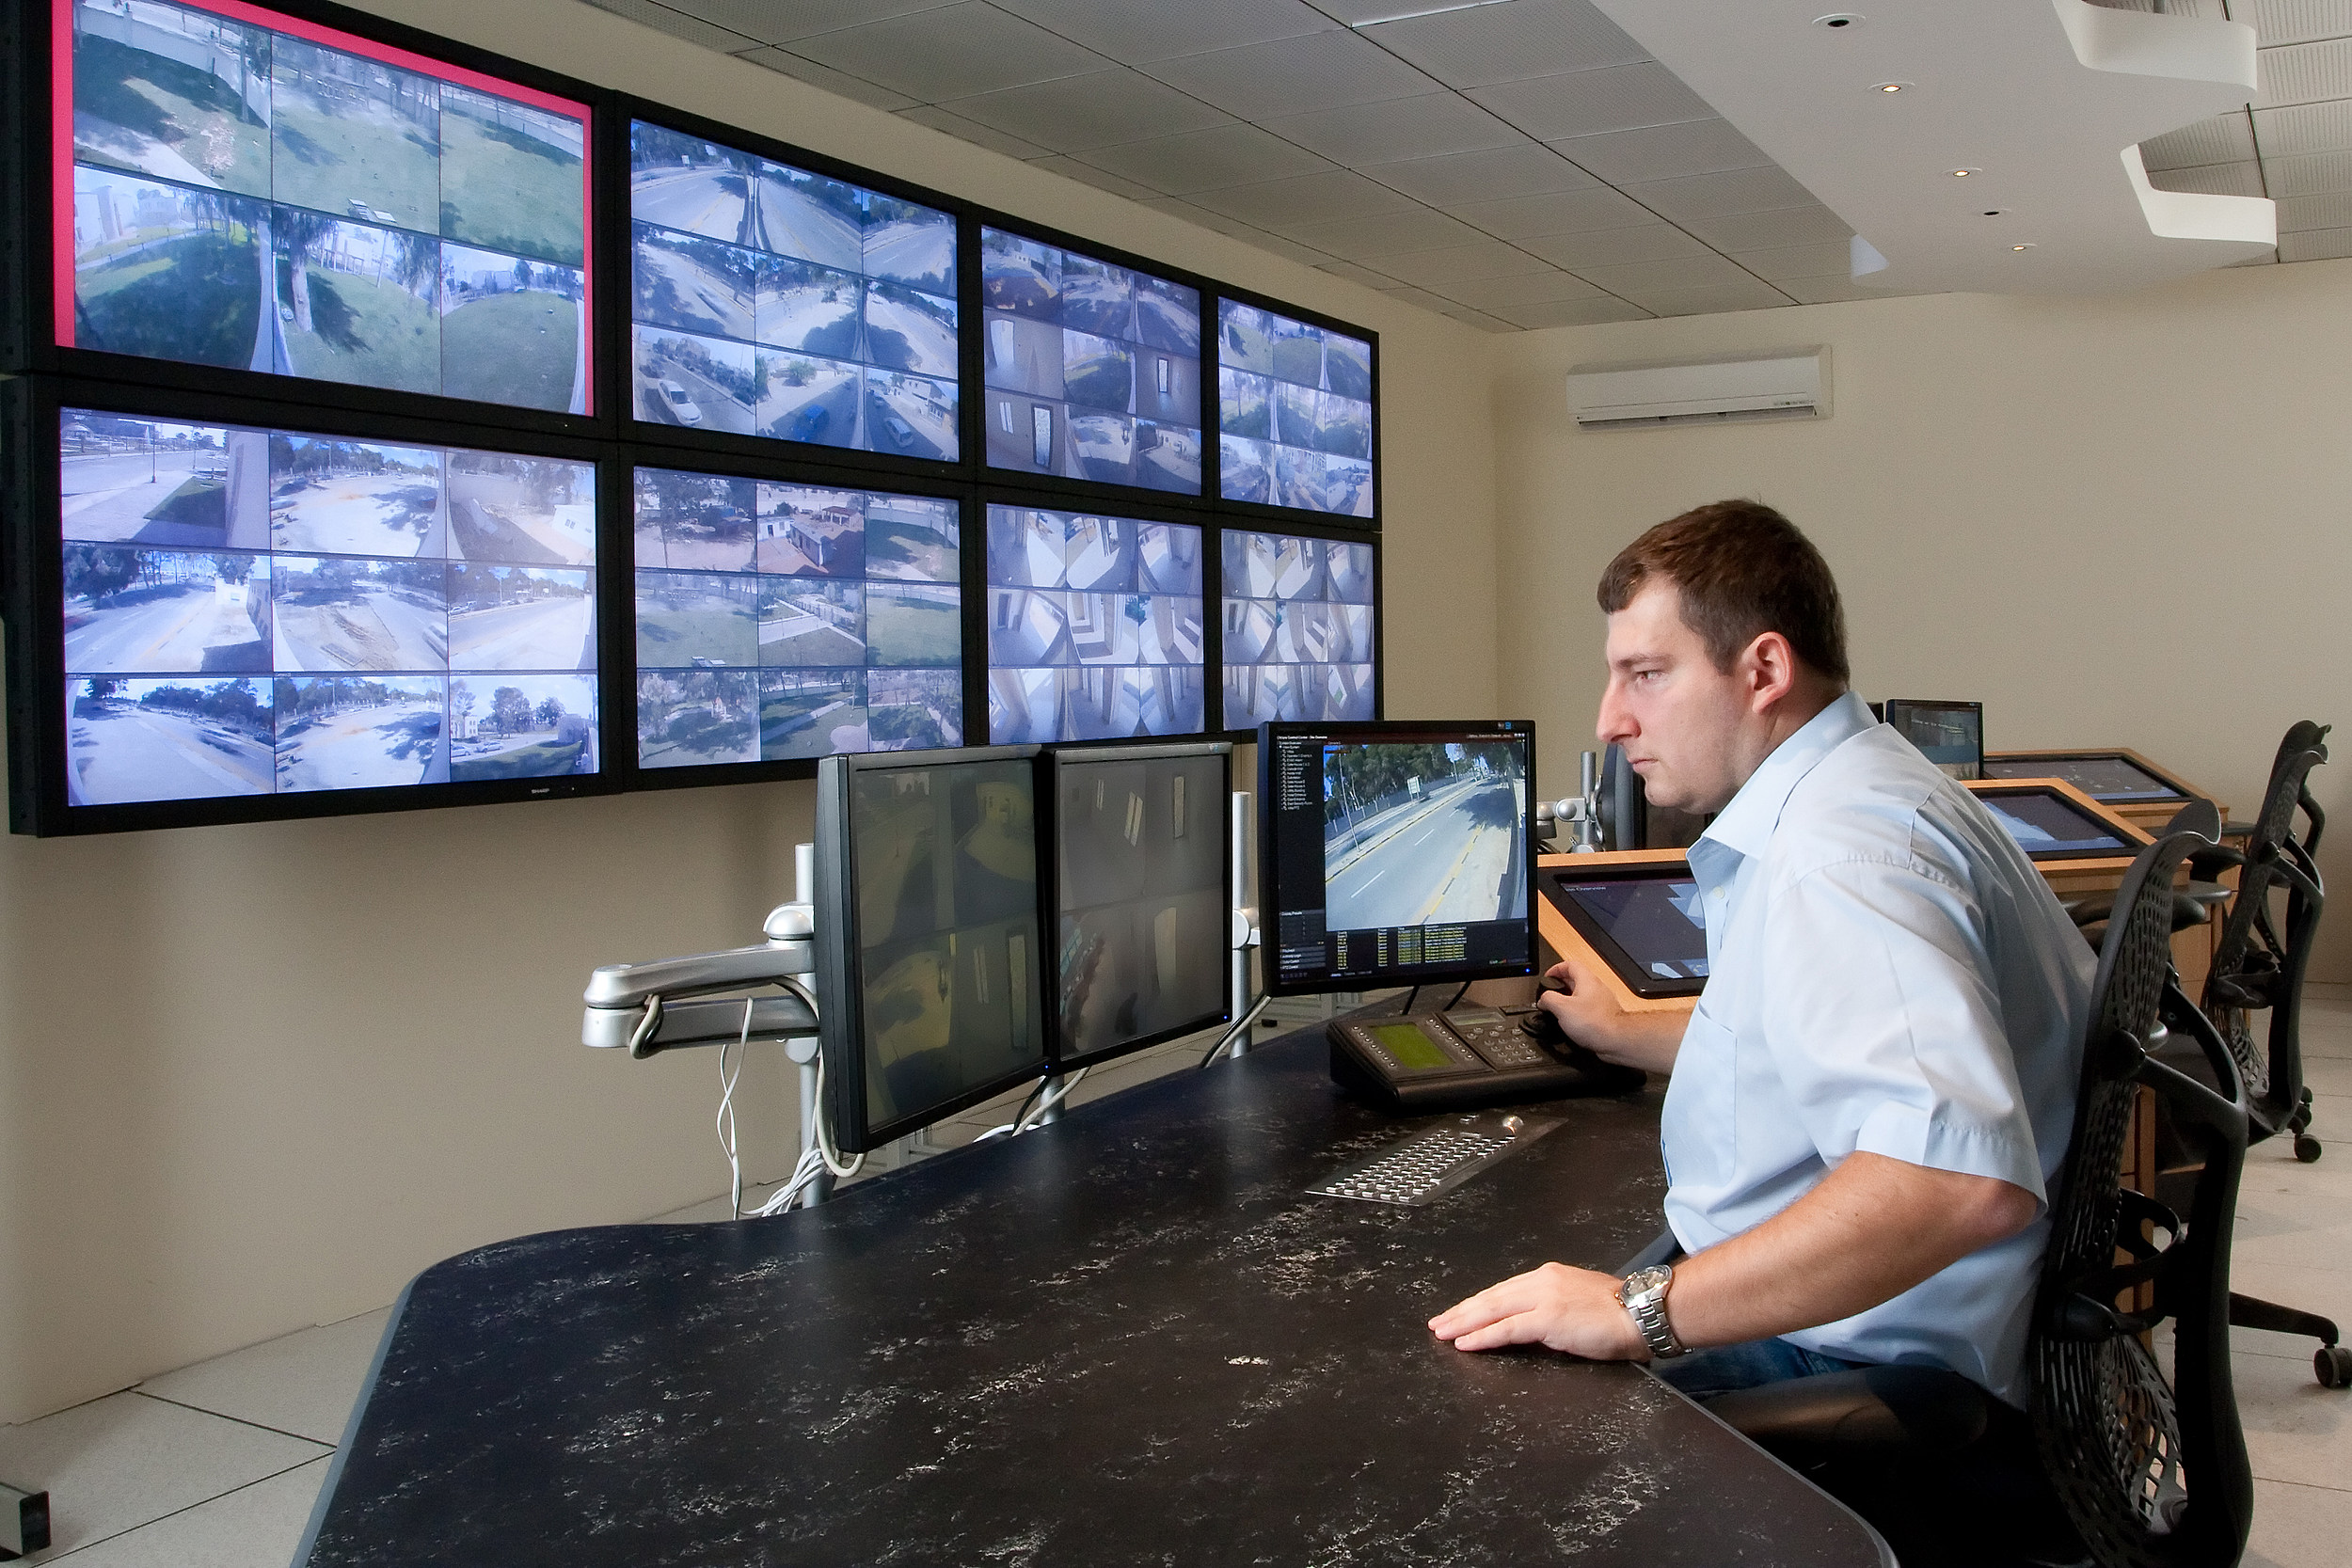 Man Monitoring Cameras